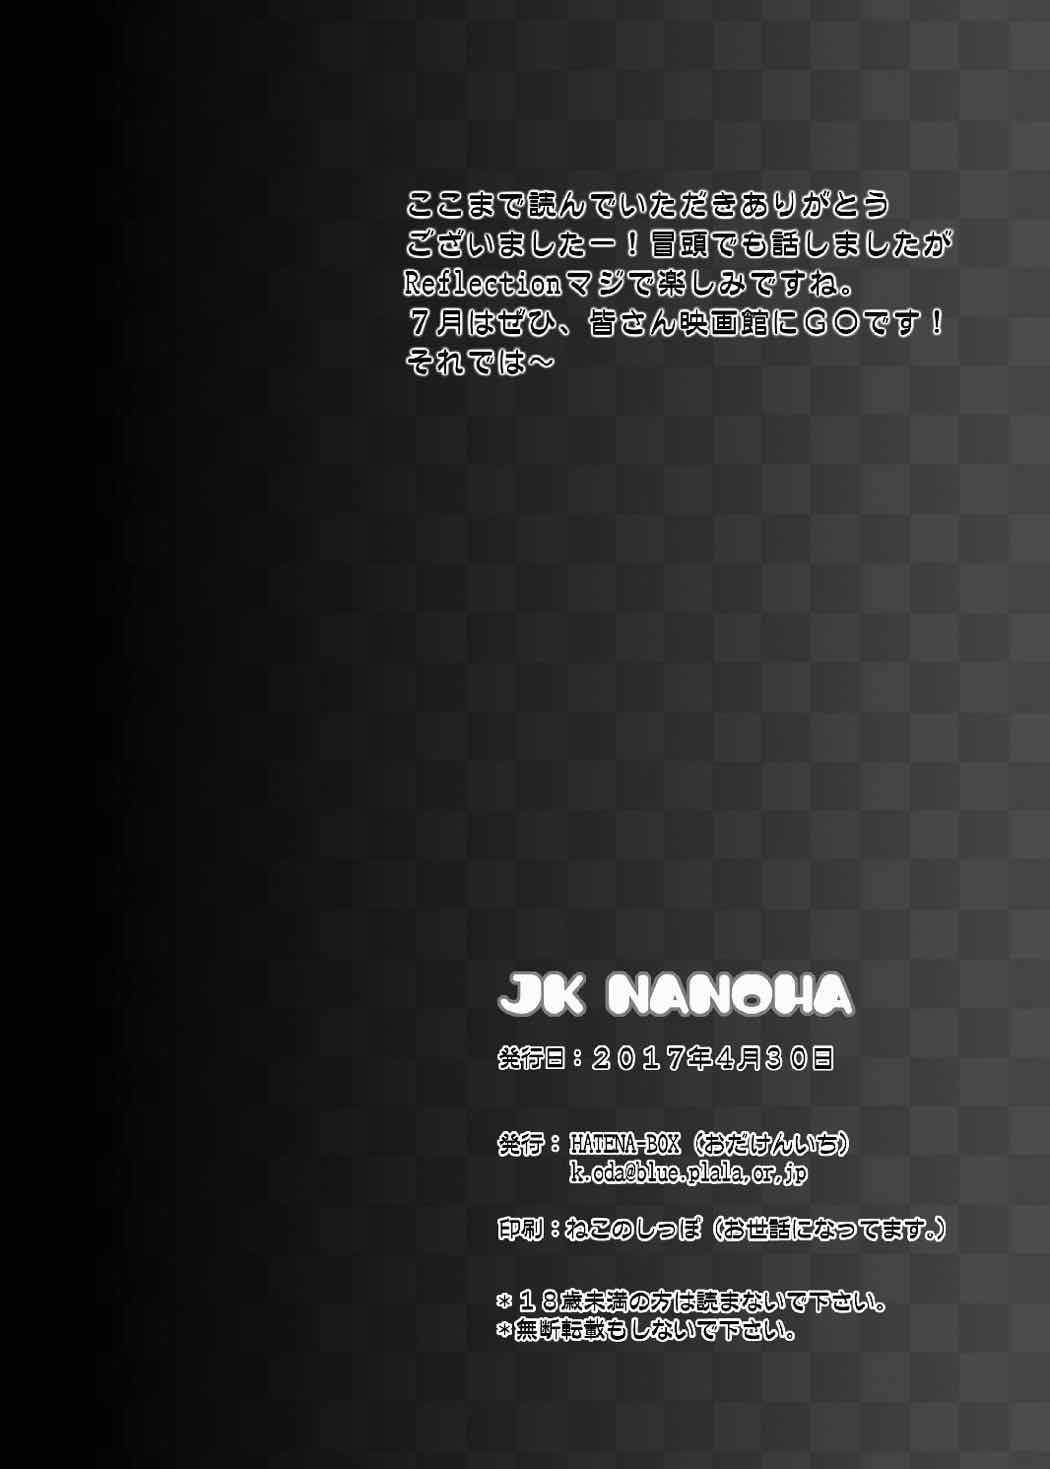 JK NANOHA 24